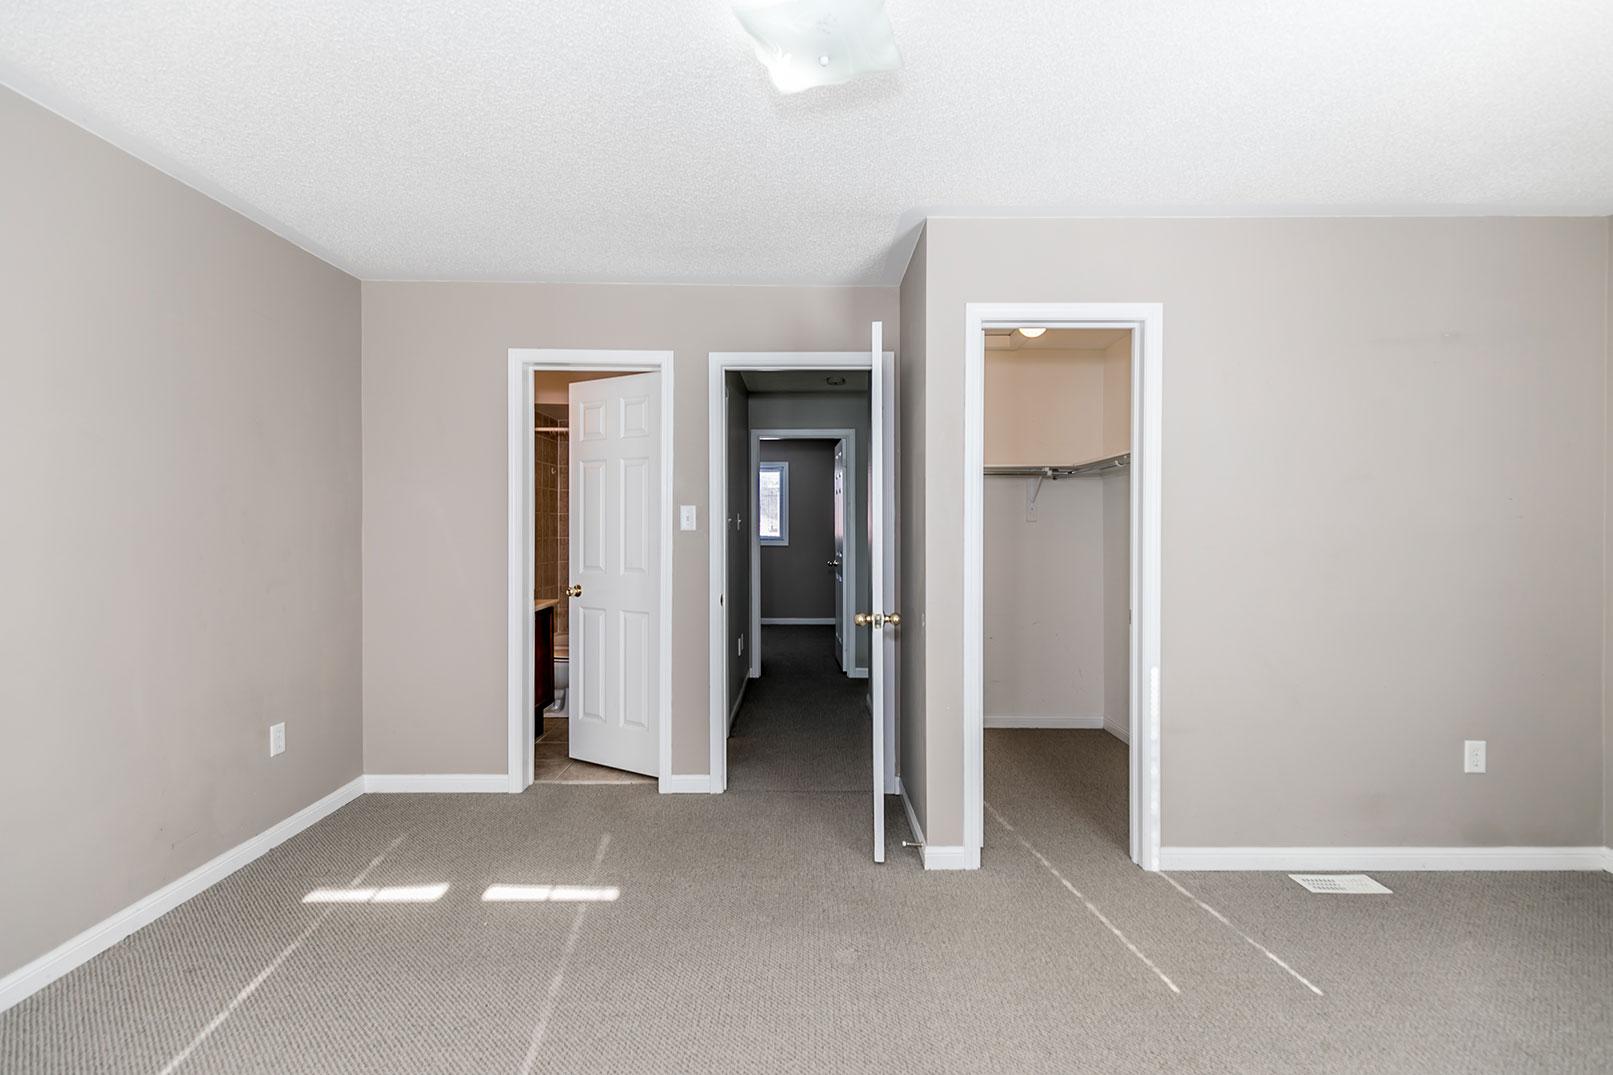 Rdiwell Bedroom Before Renovation